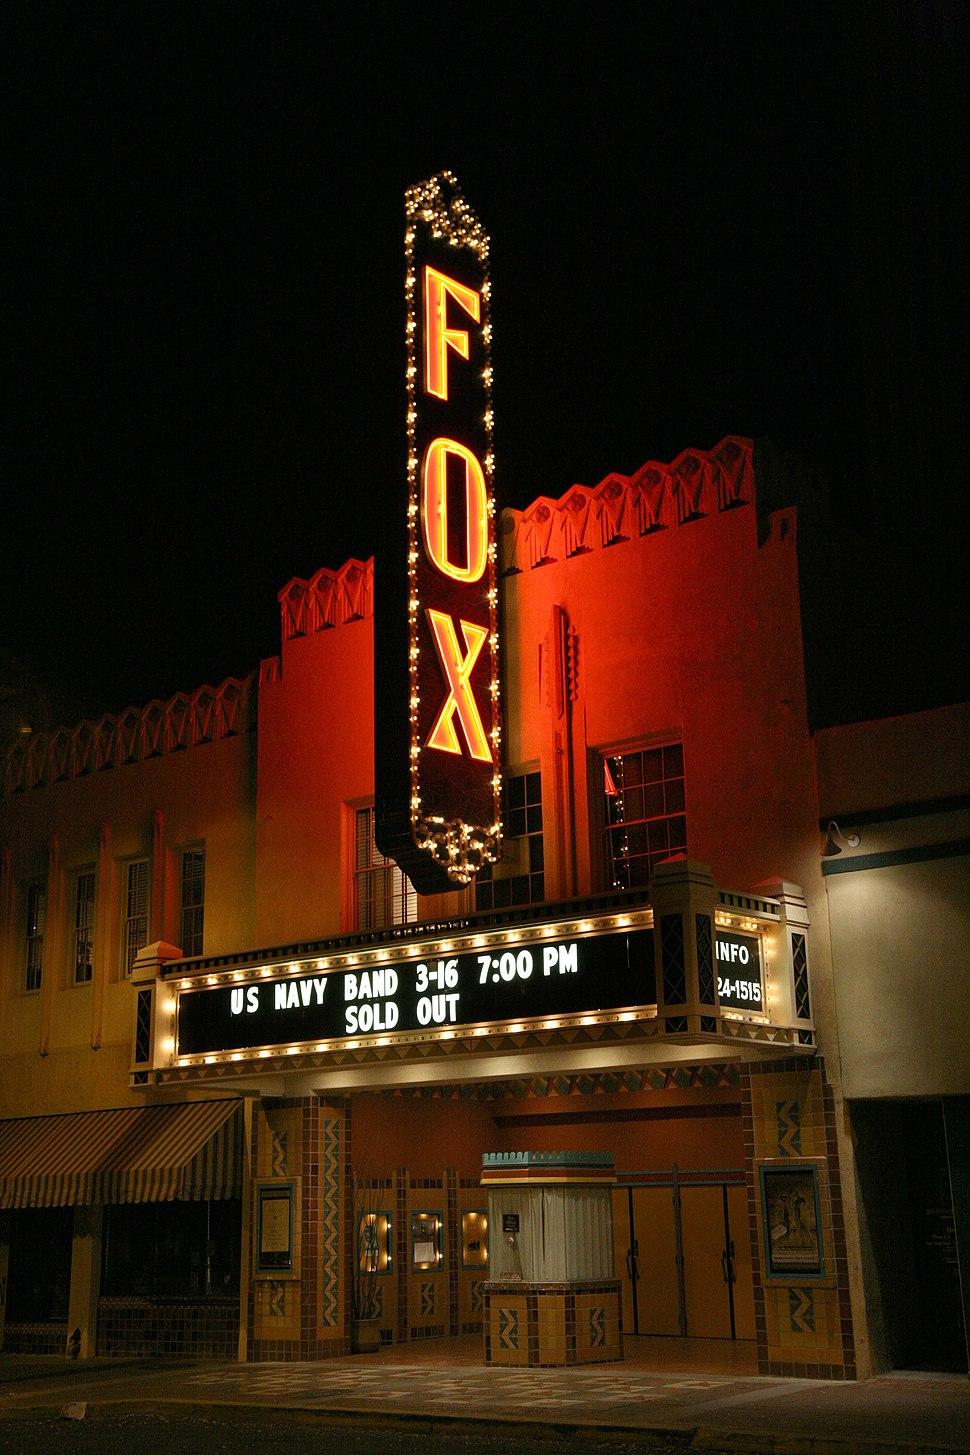 Fox theater Tucson